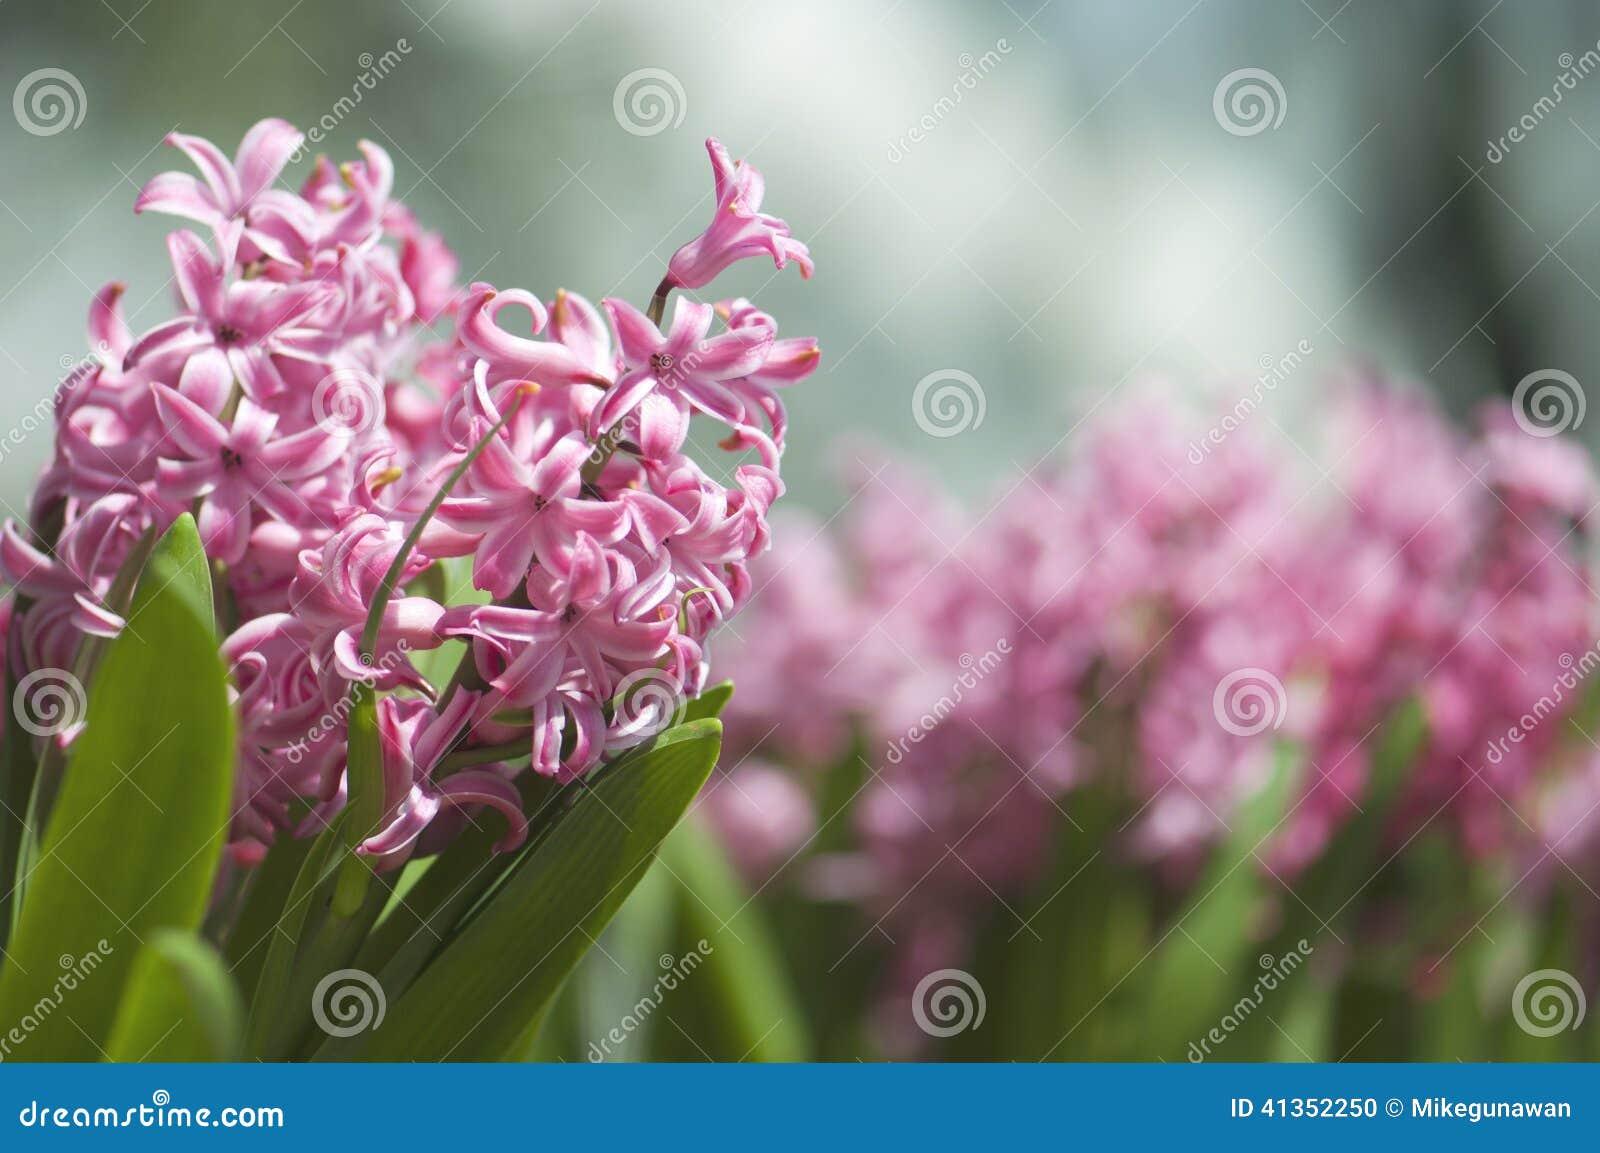 Beautiful violet pink little flowers in the garden stock photo download beautiful violet pink little flowers in the garden stock photo image of marina mightylinksfo